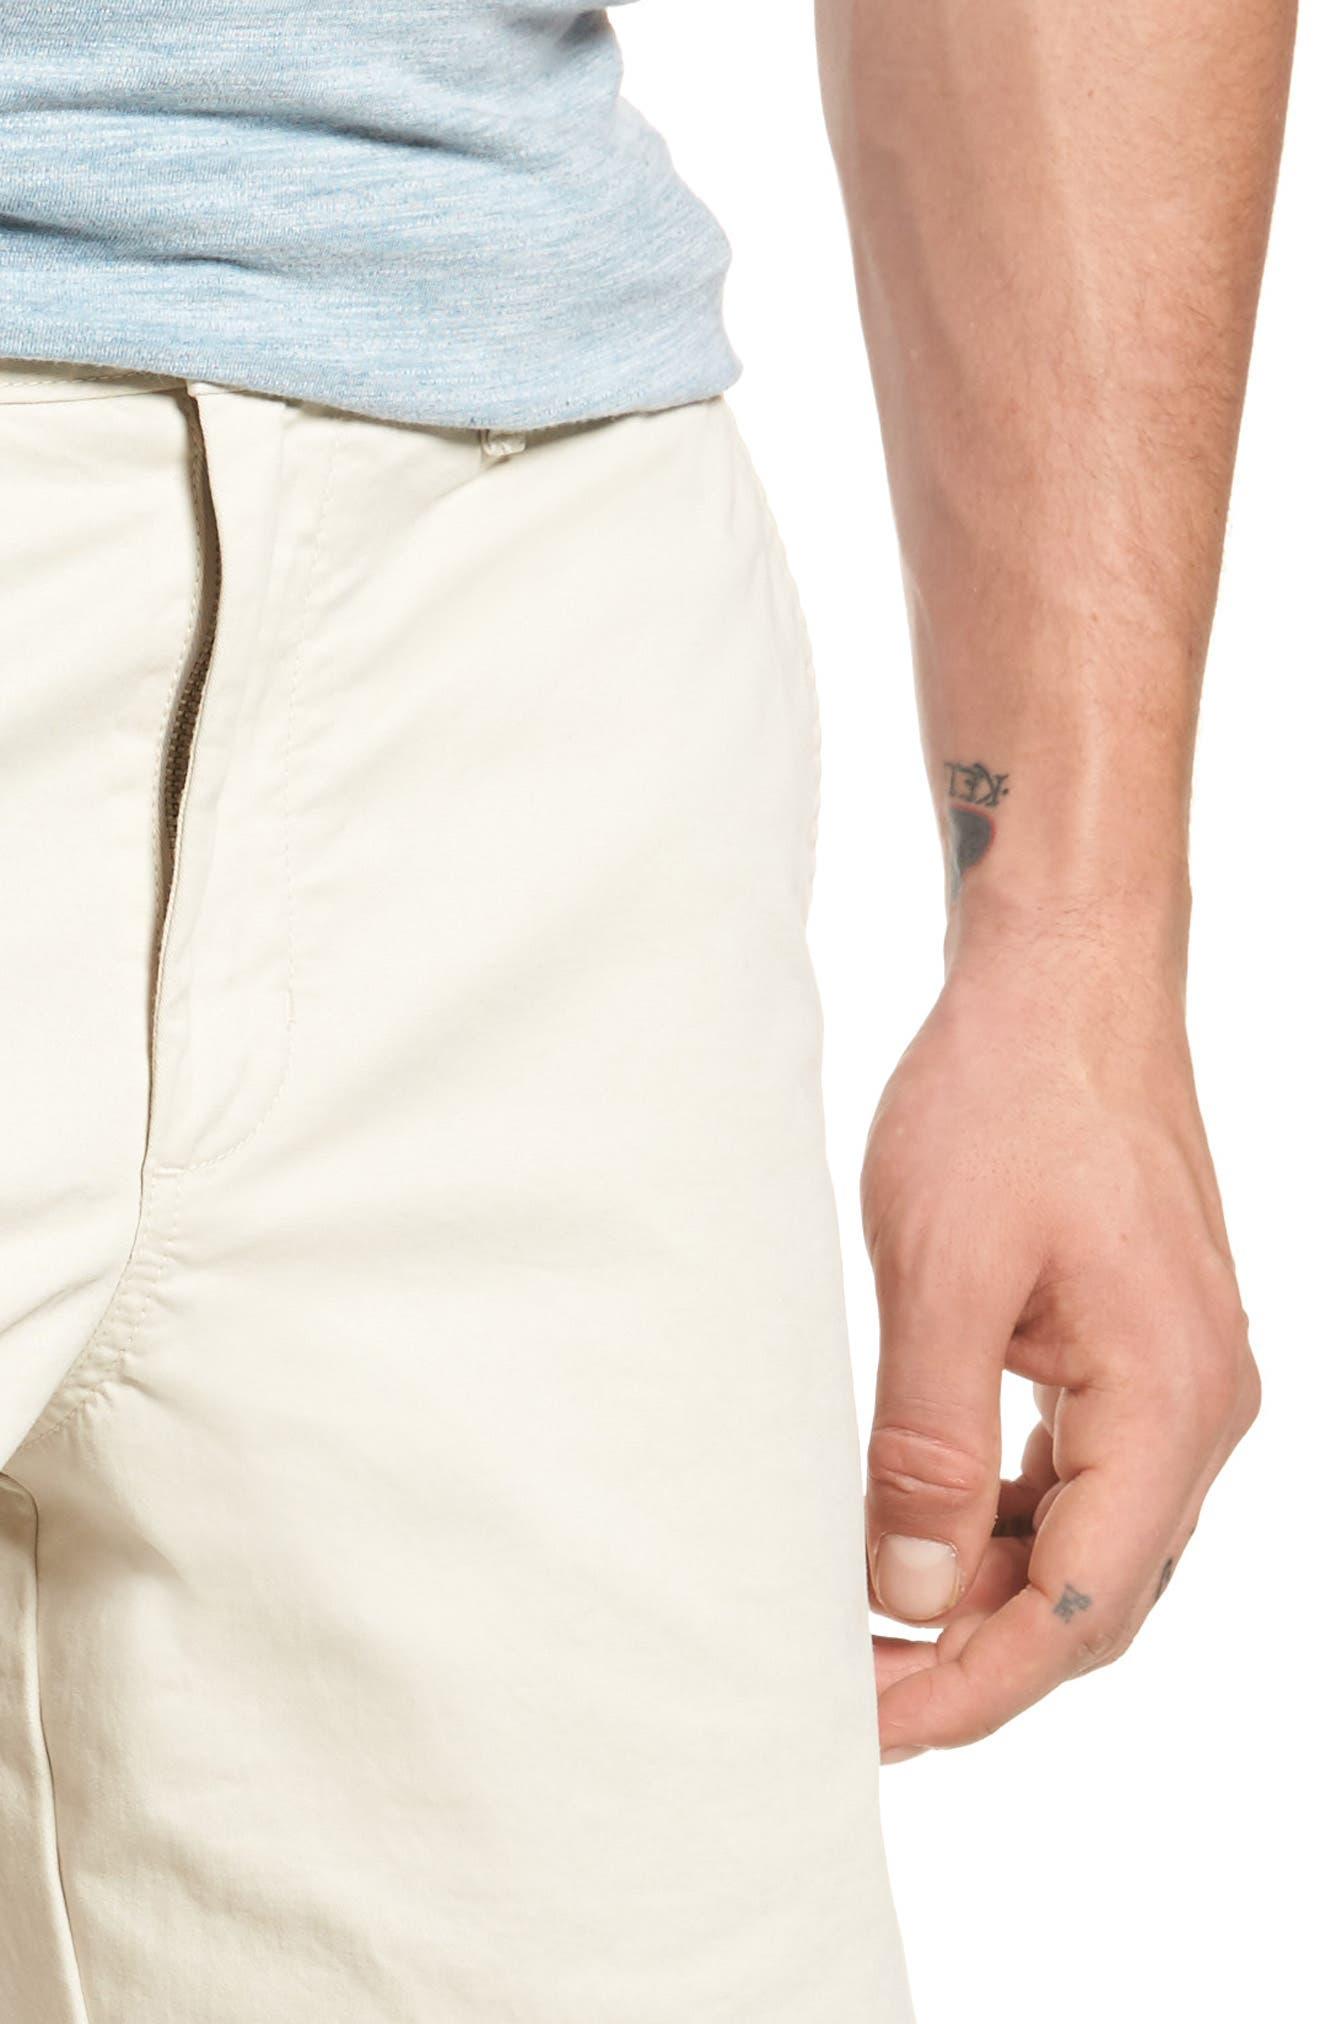 Ballard Slim Fit Stretch Chino 9-Inch Shorts,                             Alternate thumbnail 40, color,